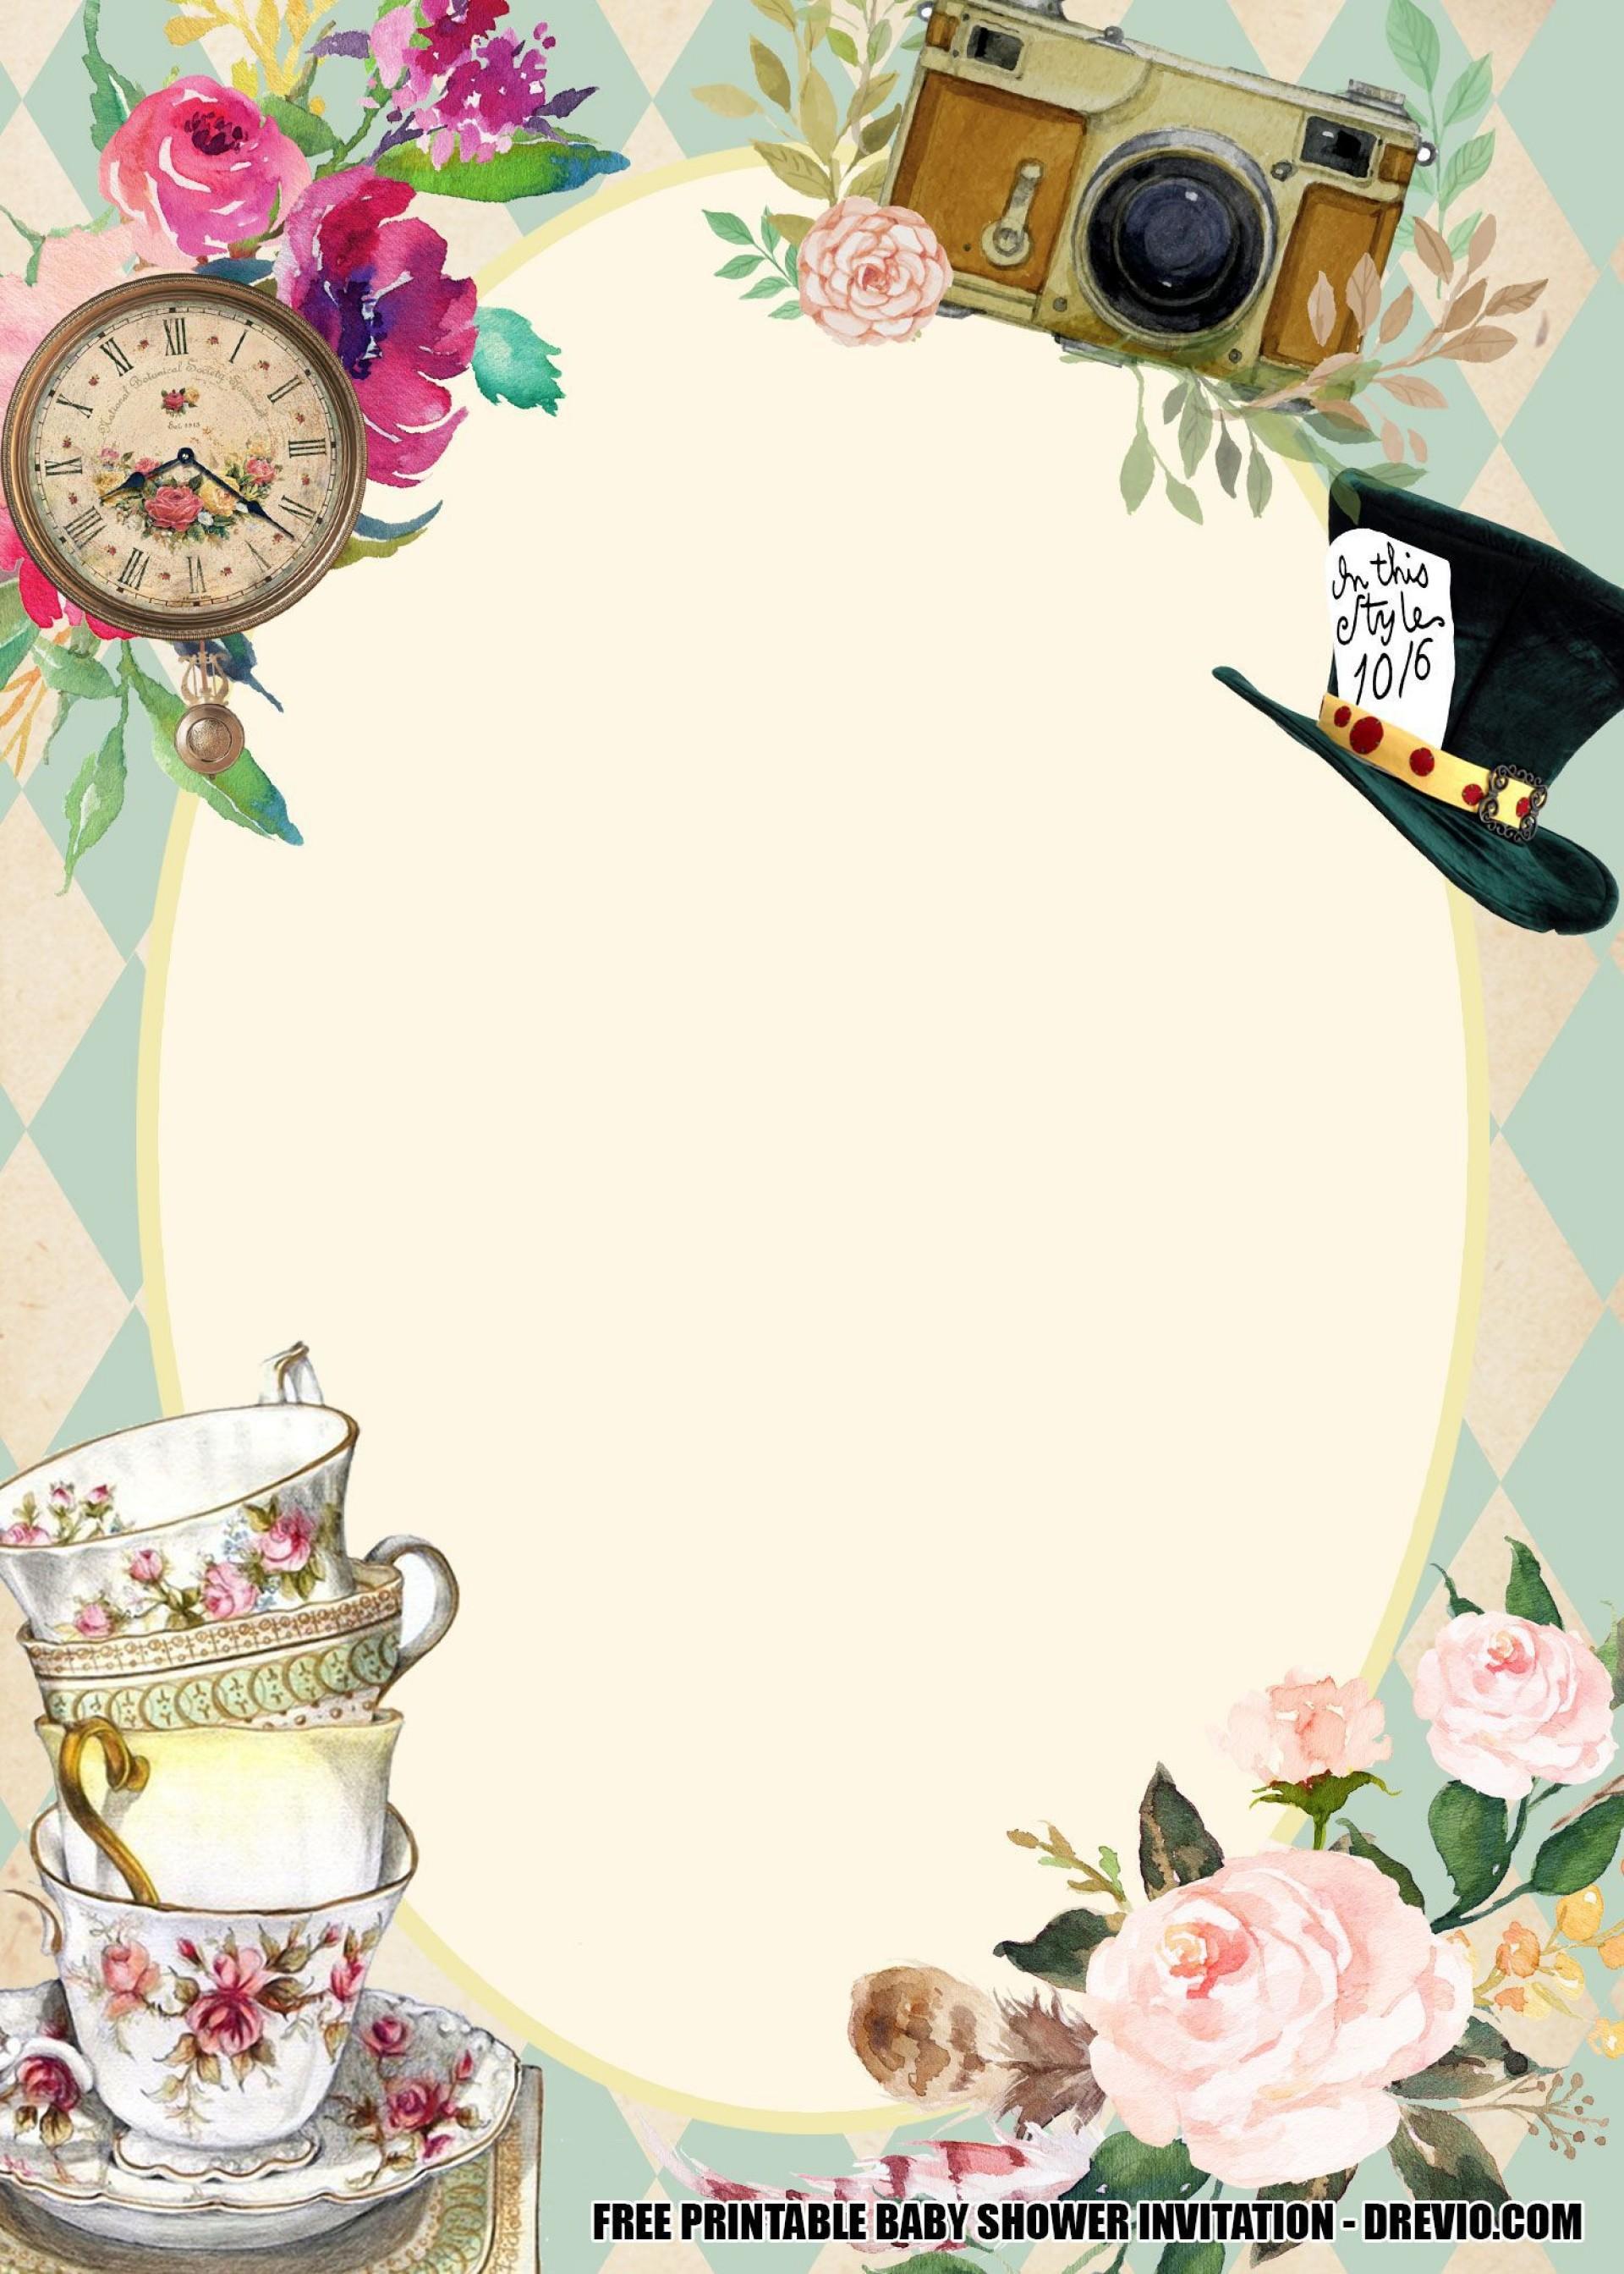 004 Sensational Alice In Wonderland Invite Template Design  Party Invitation Free1920